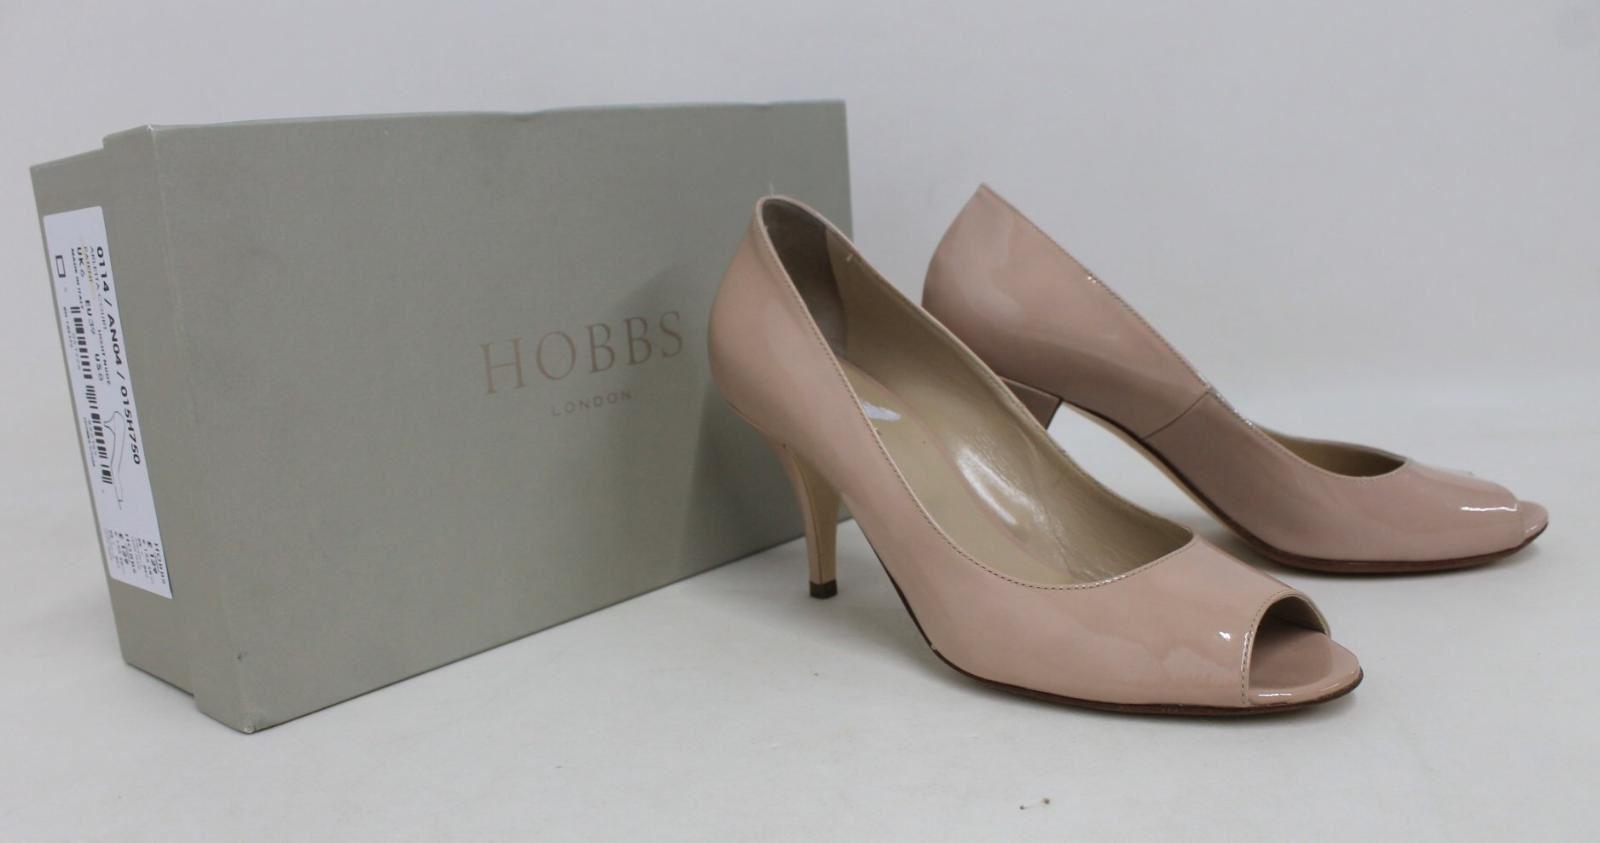 HOBBS-Ladies-Light-Nude-Patent-Leather-Peep-Toe-Arletta-Court-Shoes-UK6-EU39-NEW